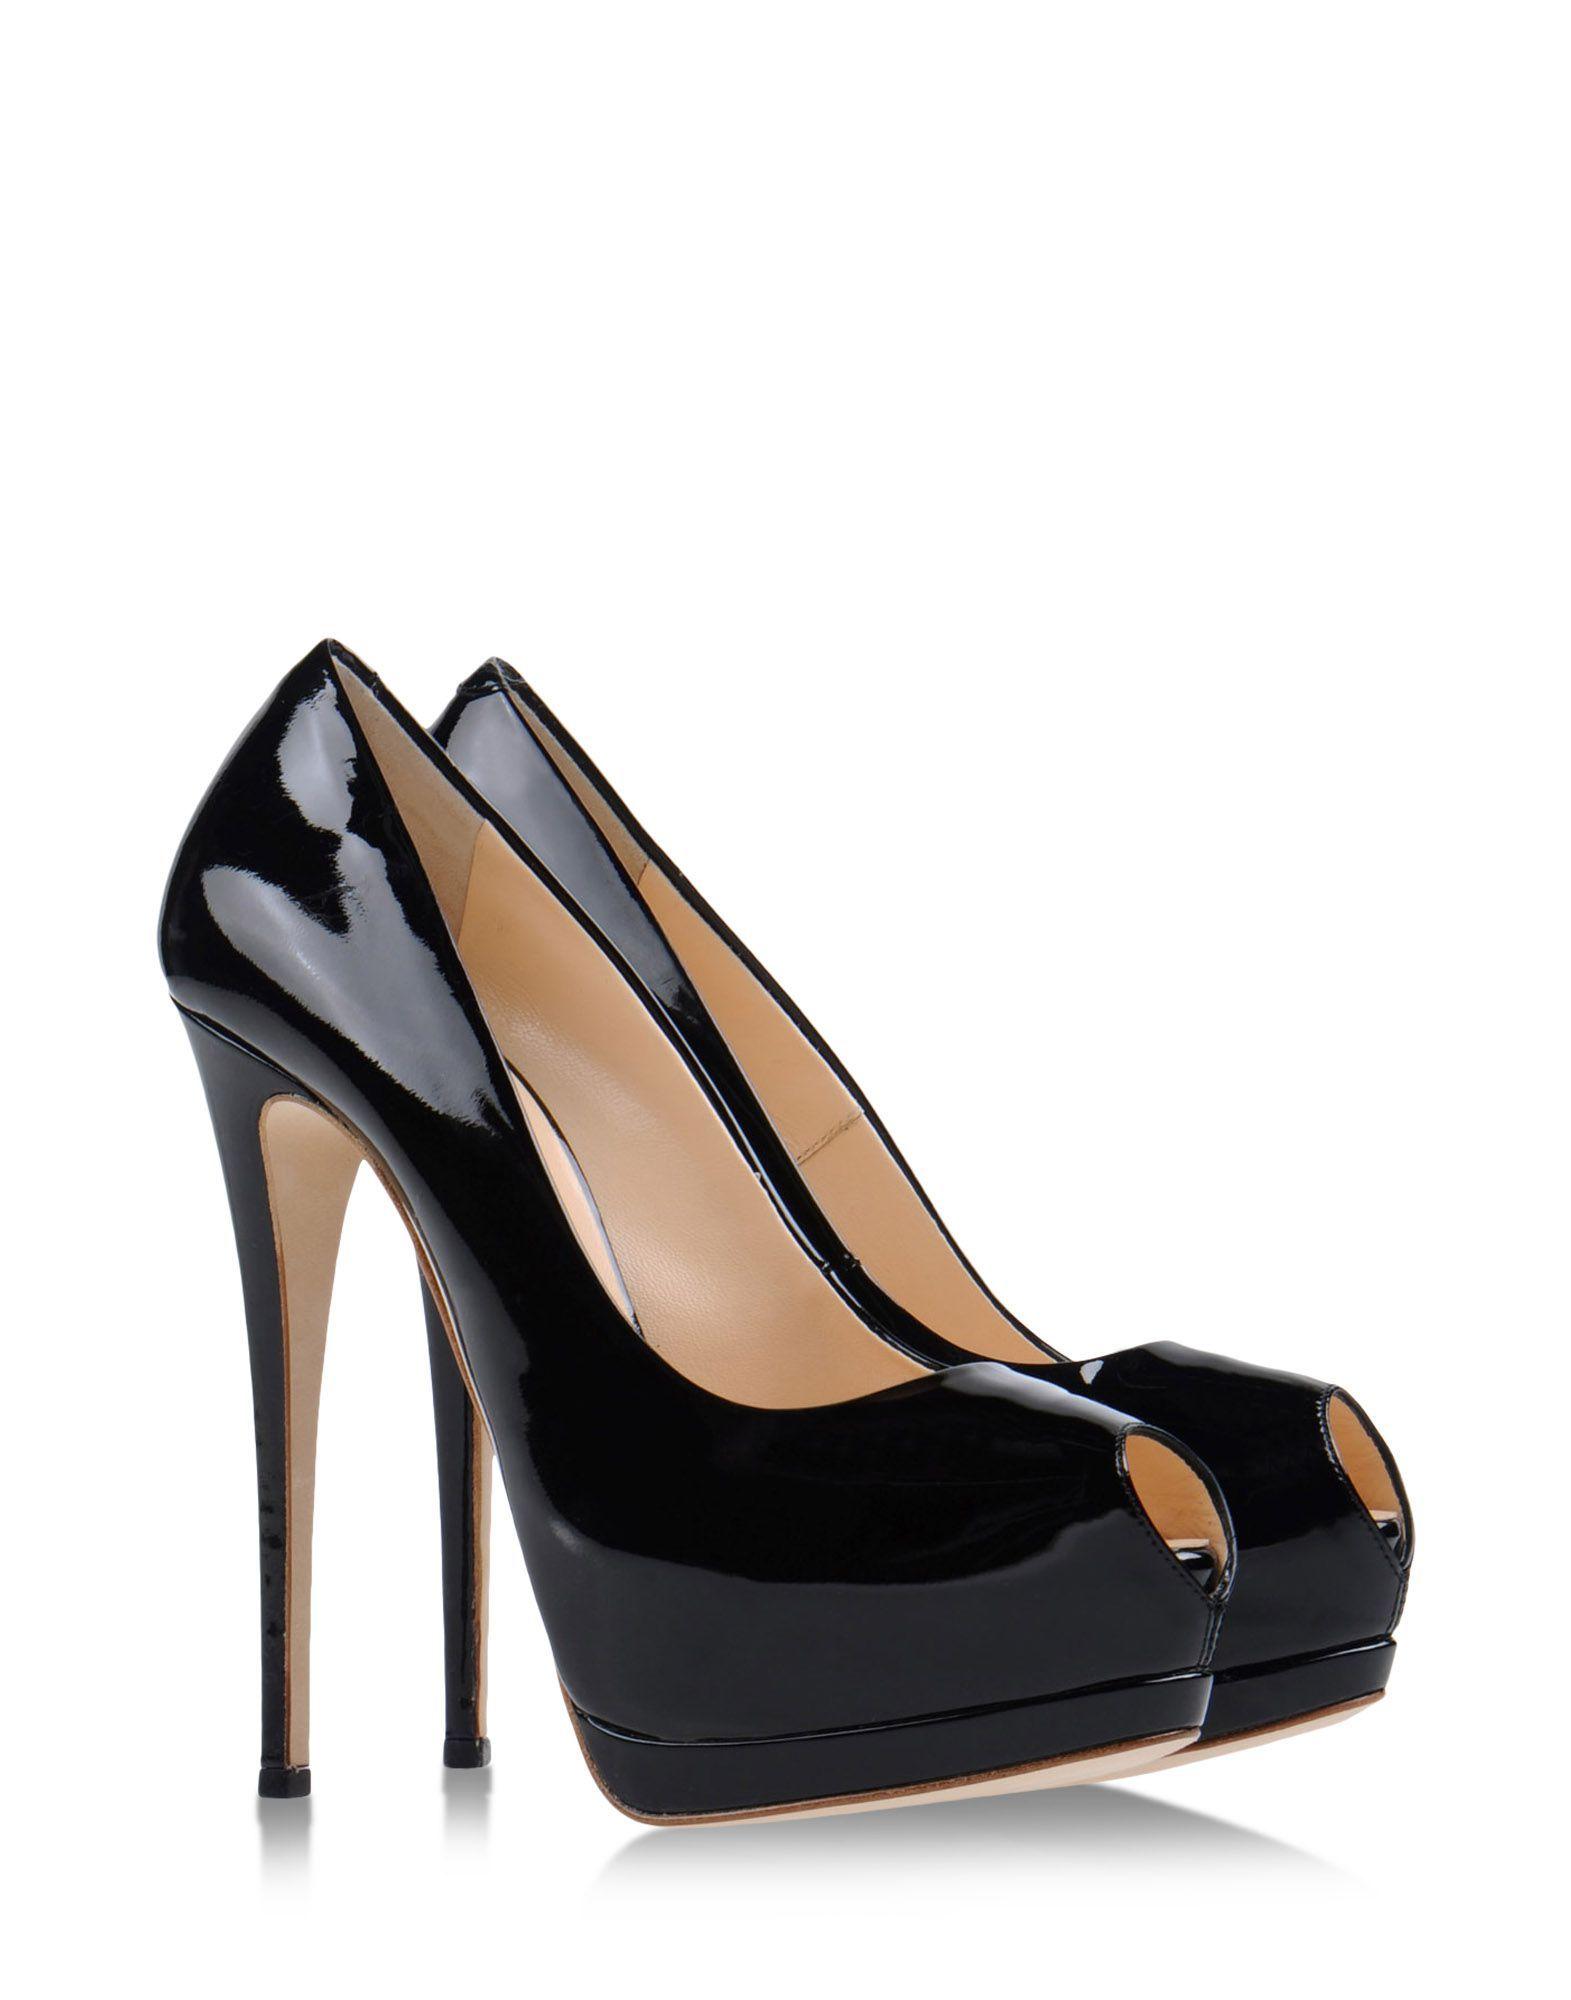 shoes heels, Black high heels shoes